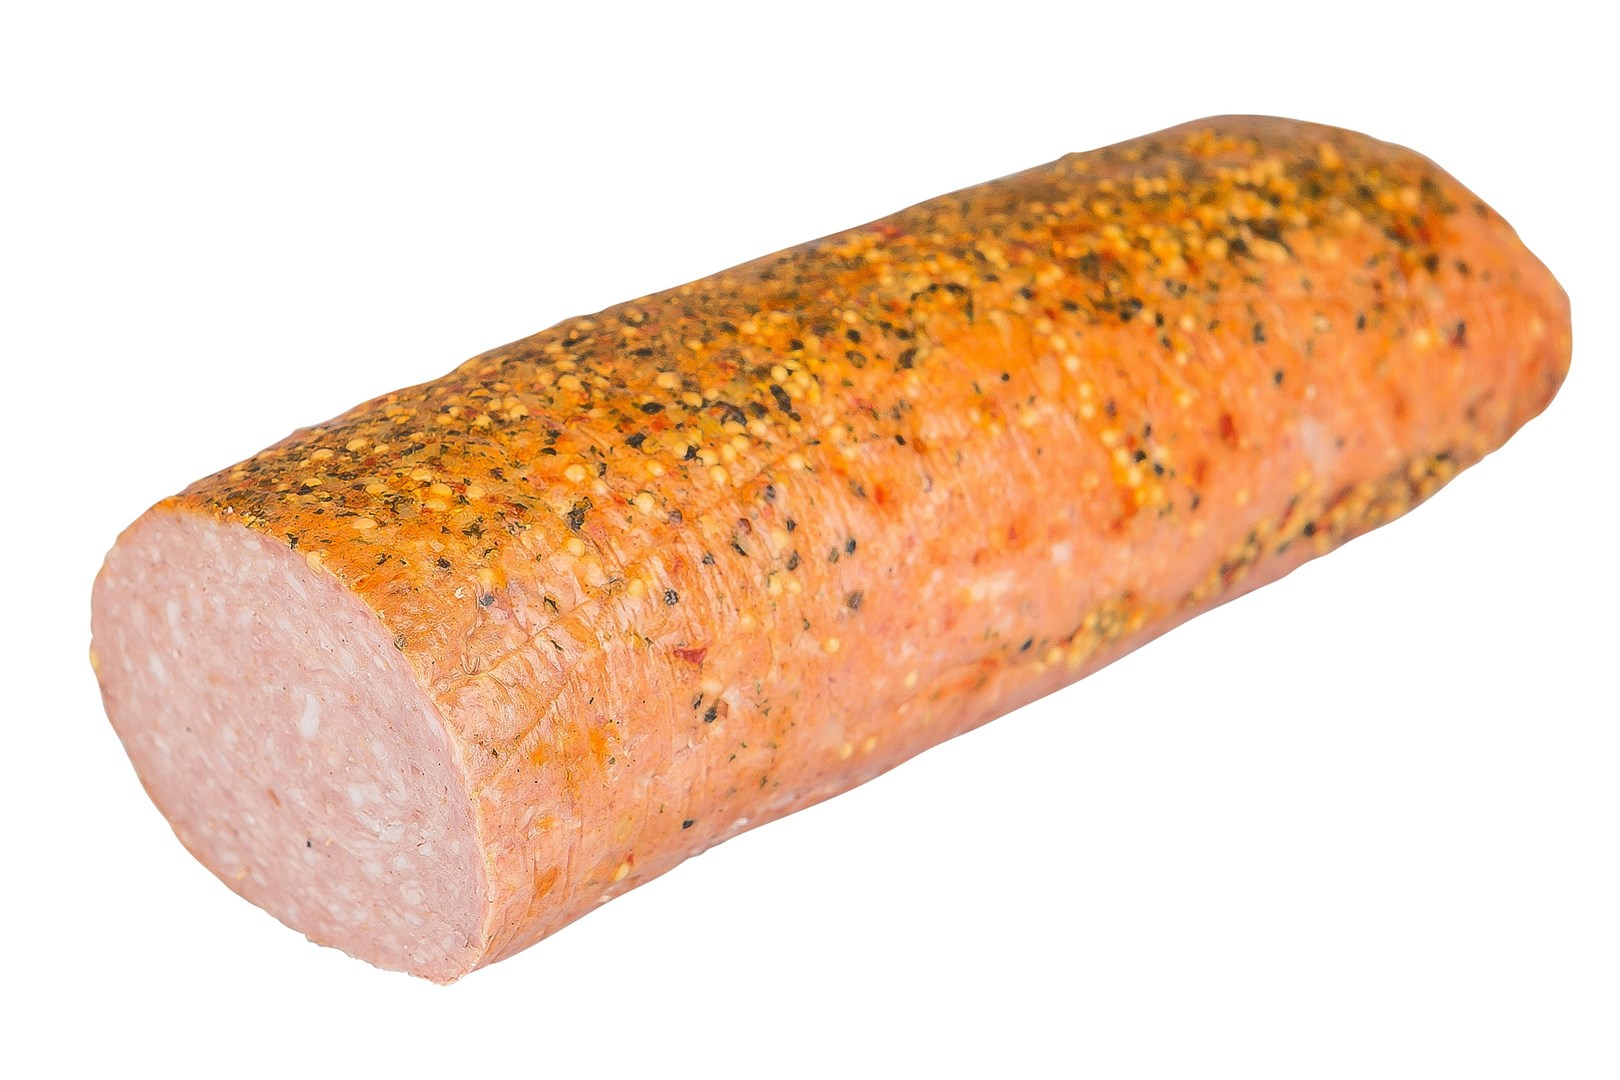 Productafbeelding Grillworst pittig broodje